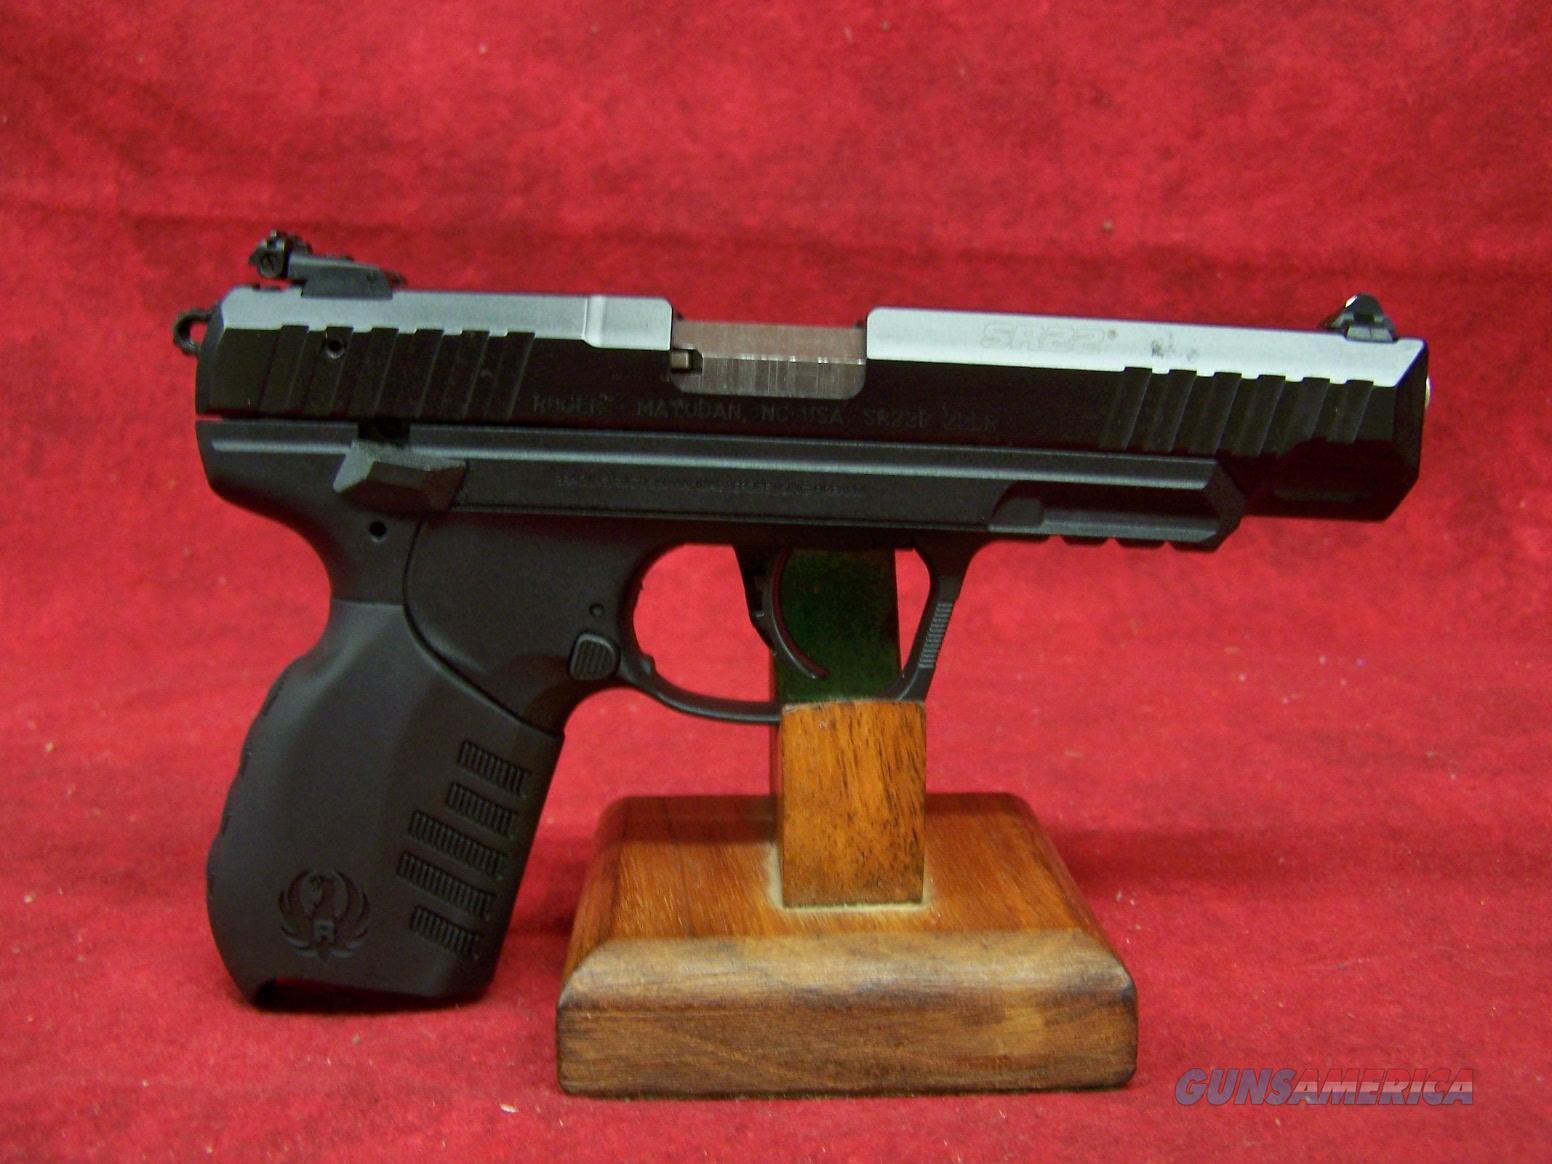 Ruger SR22 Long Slide .22 Long Rifle 4.5 Inch Barrel (03620)  Guns > Pistols > Ruger Semi-Auto Pistols > SR Family > SR22